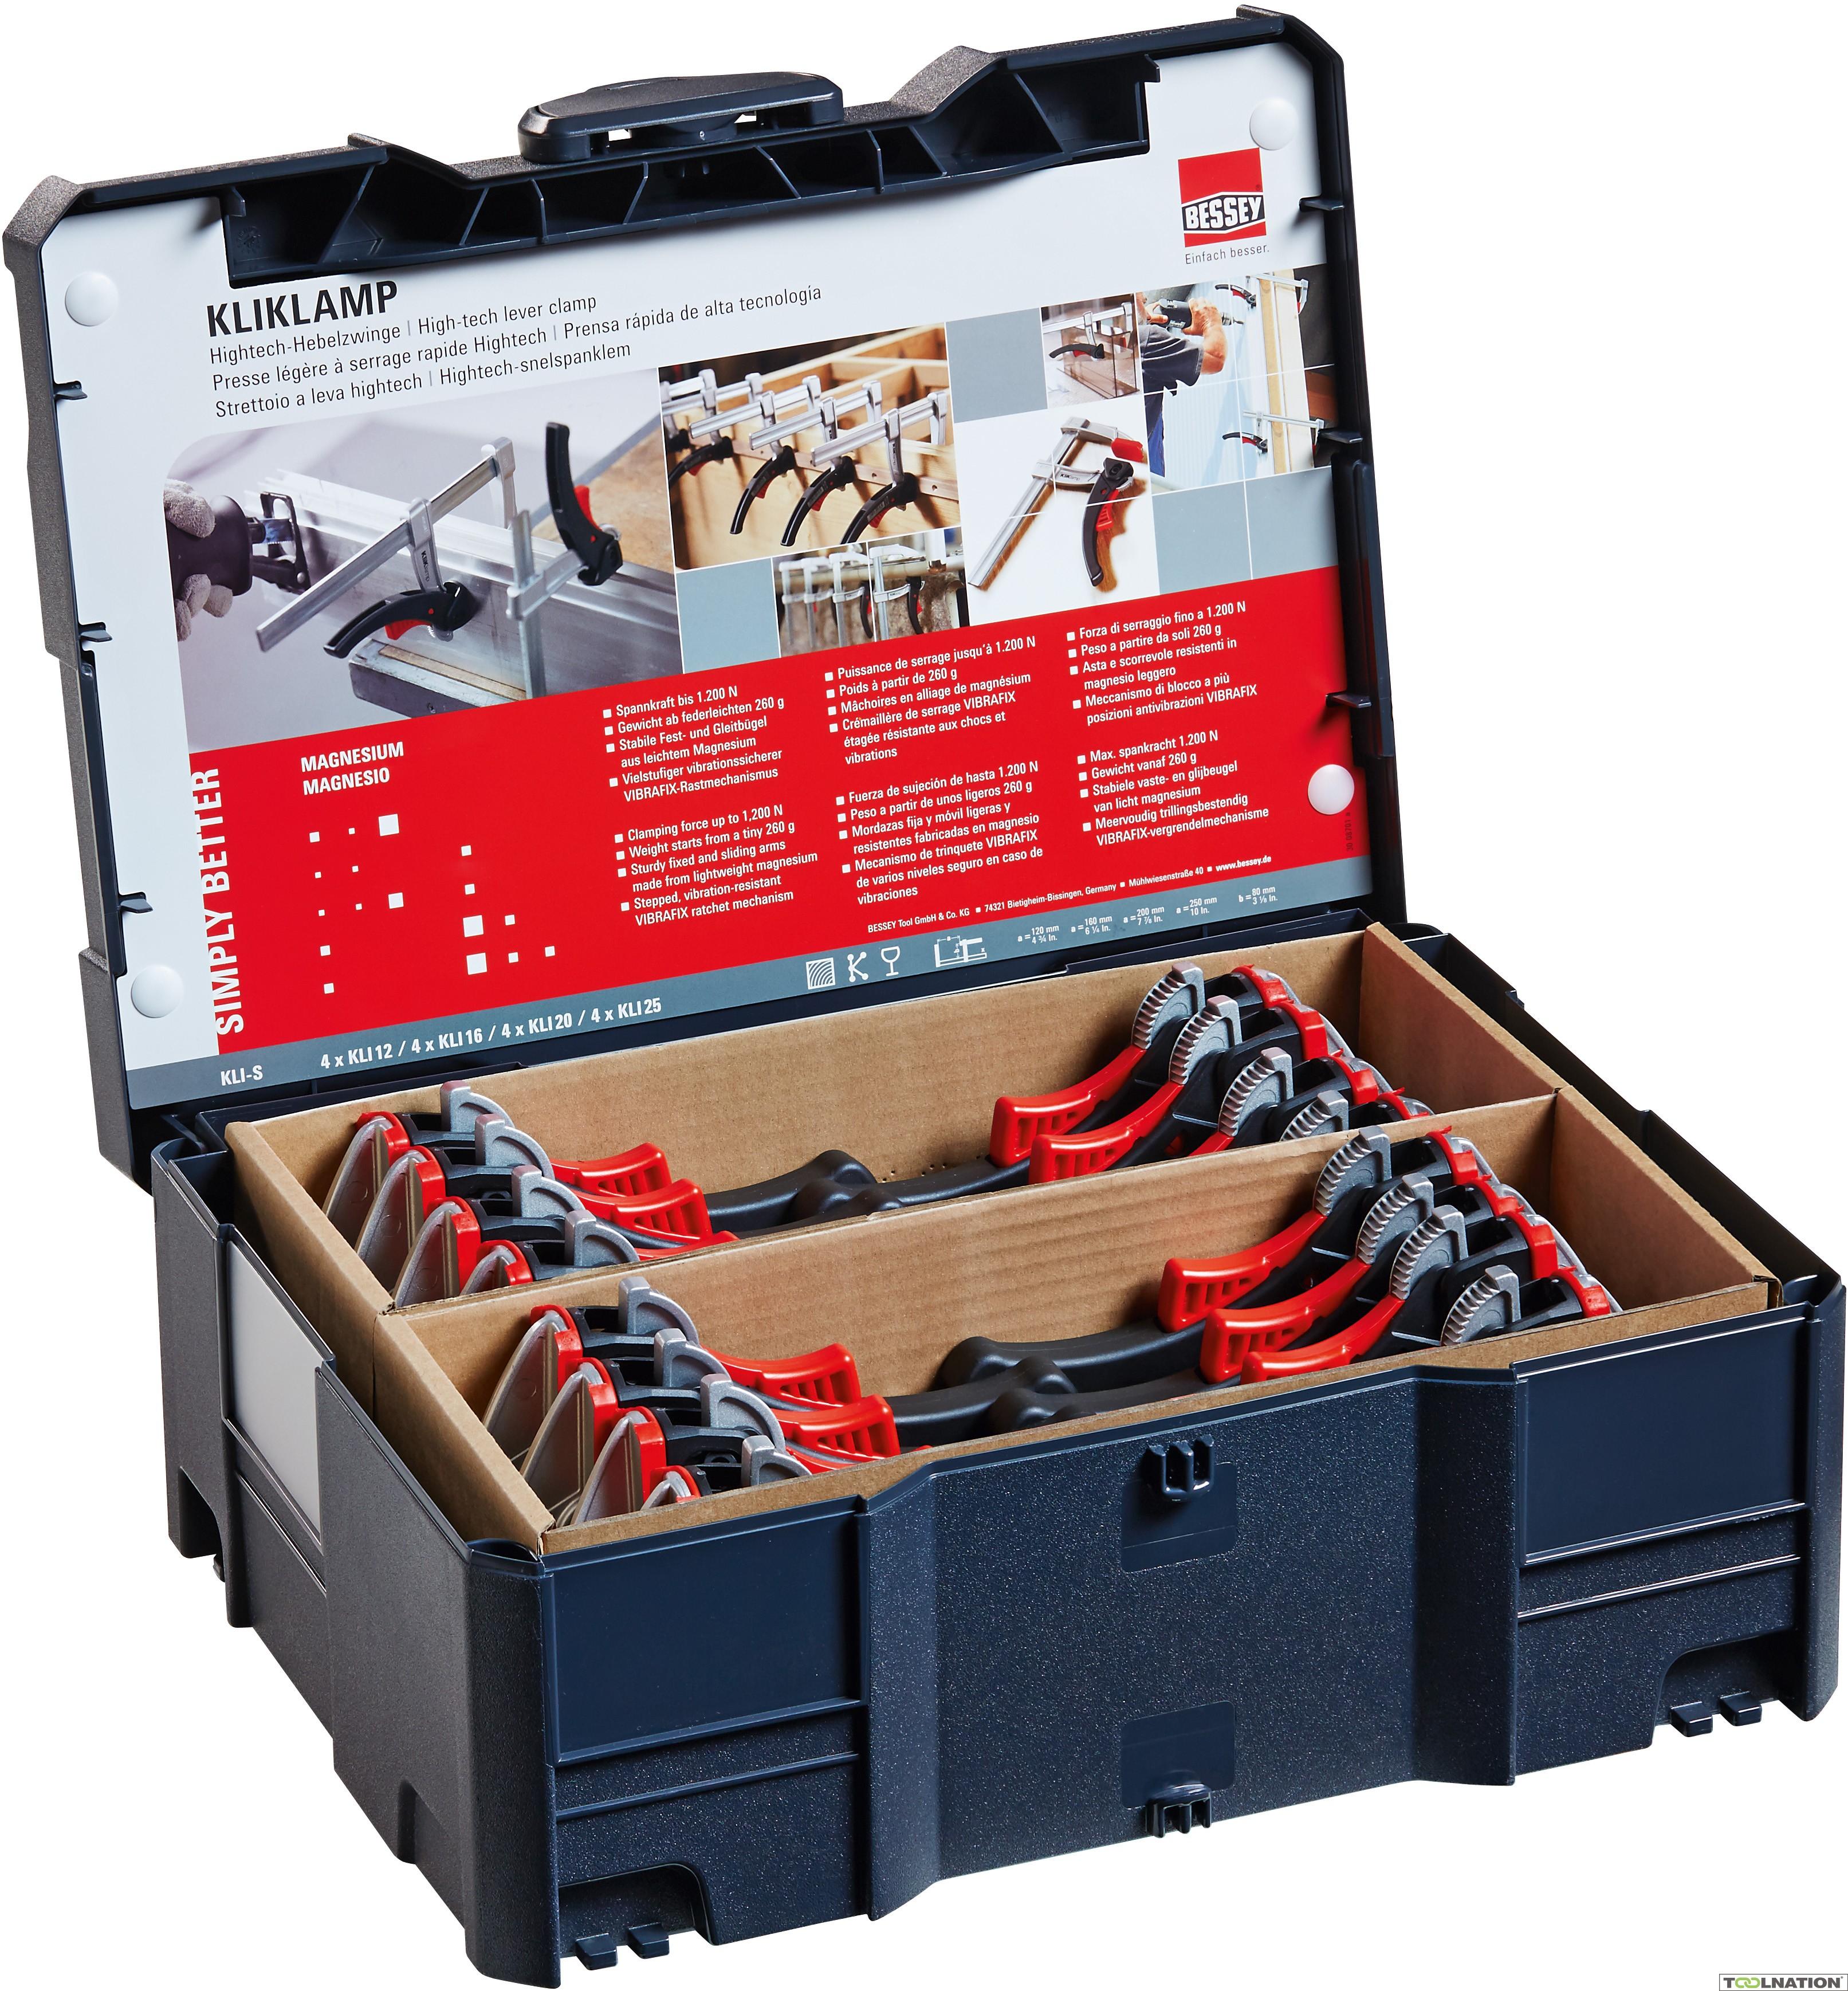 16 serre-joints KliKlamp (kli-S) en coffret Systainer (toolnation.nl)